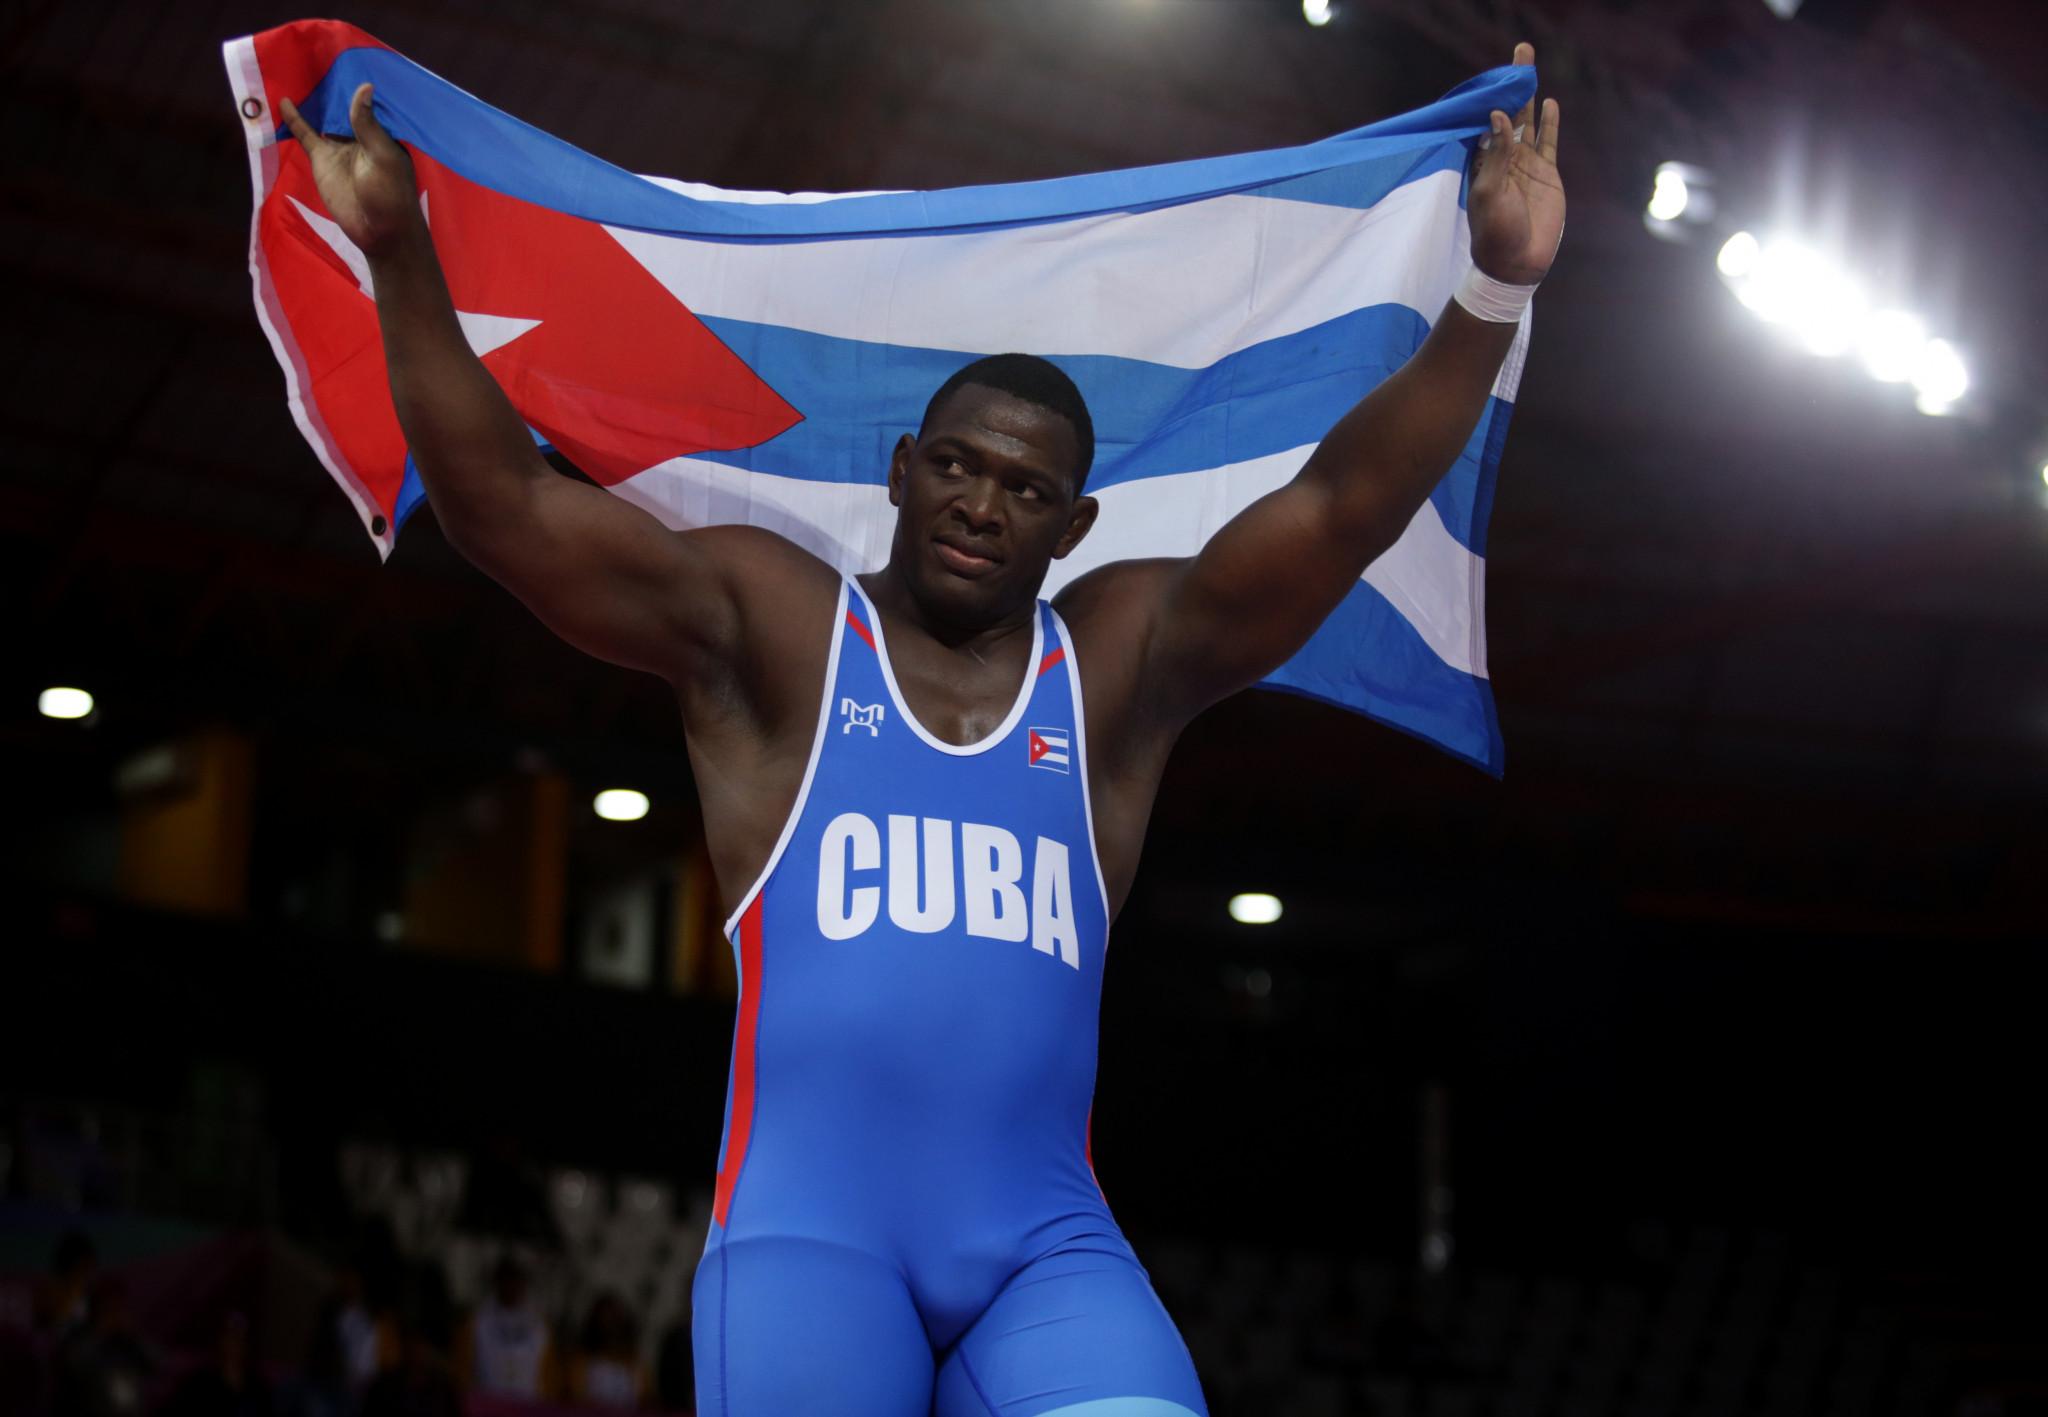 Cuban wrestling legend López to retire after Tokyo 2020